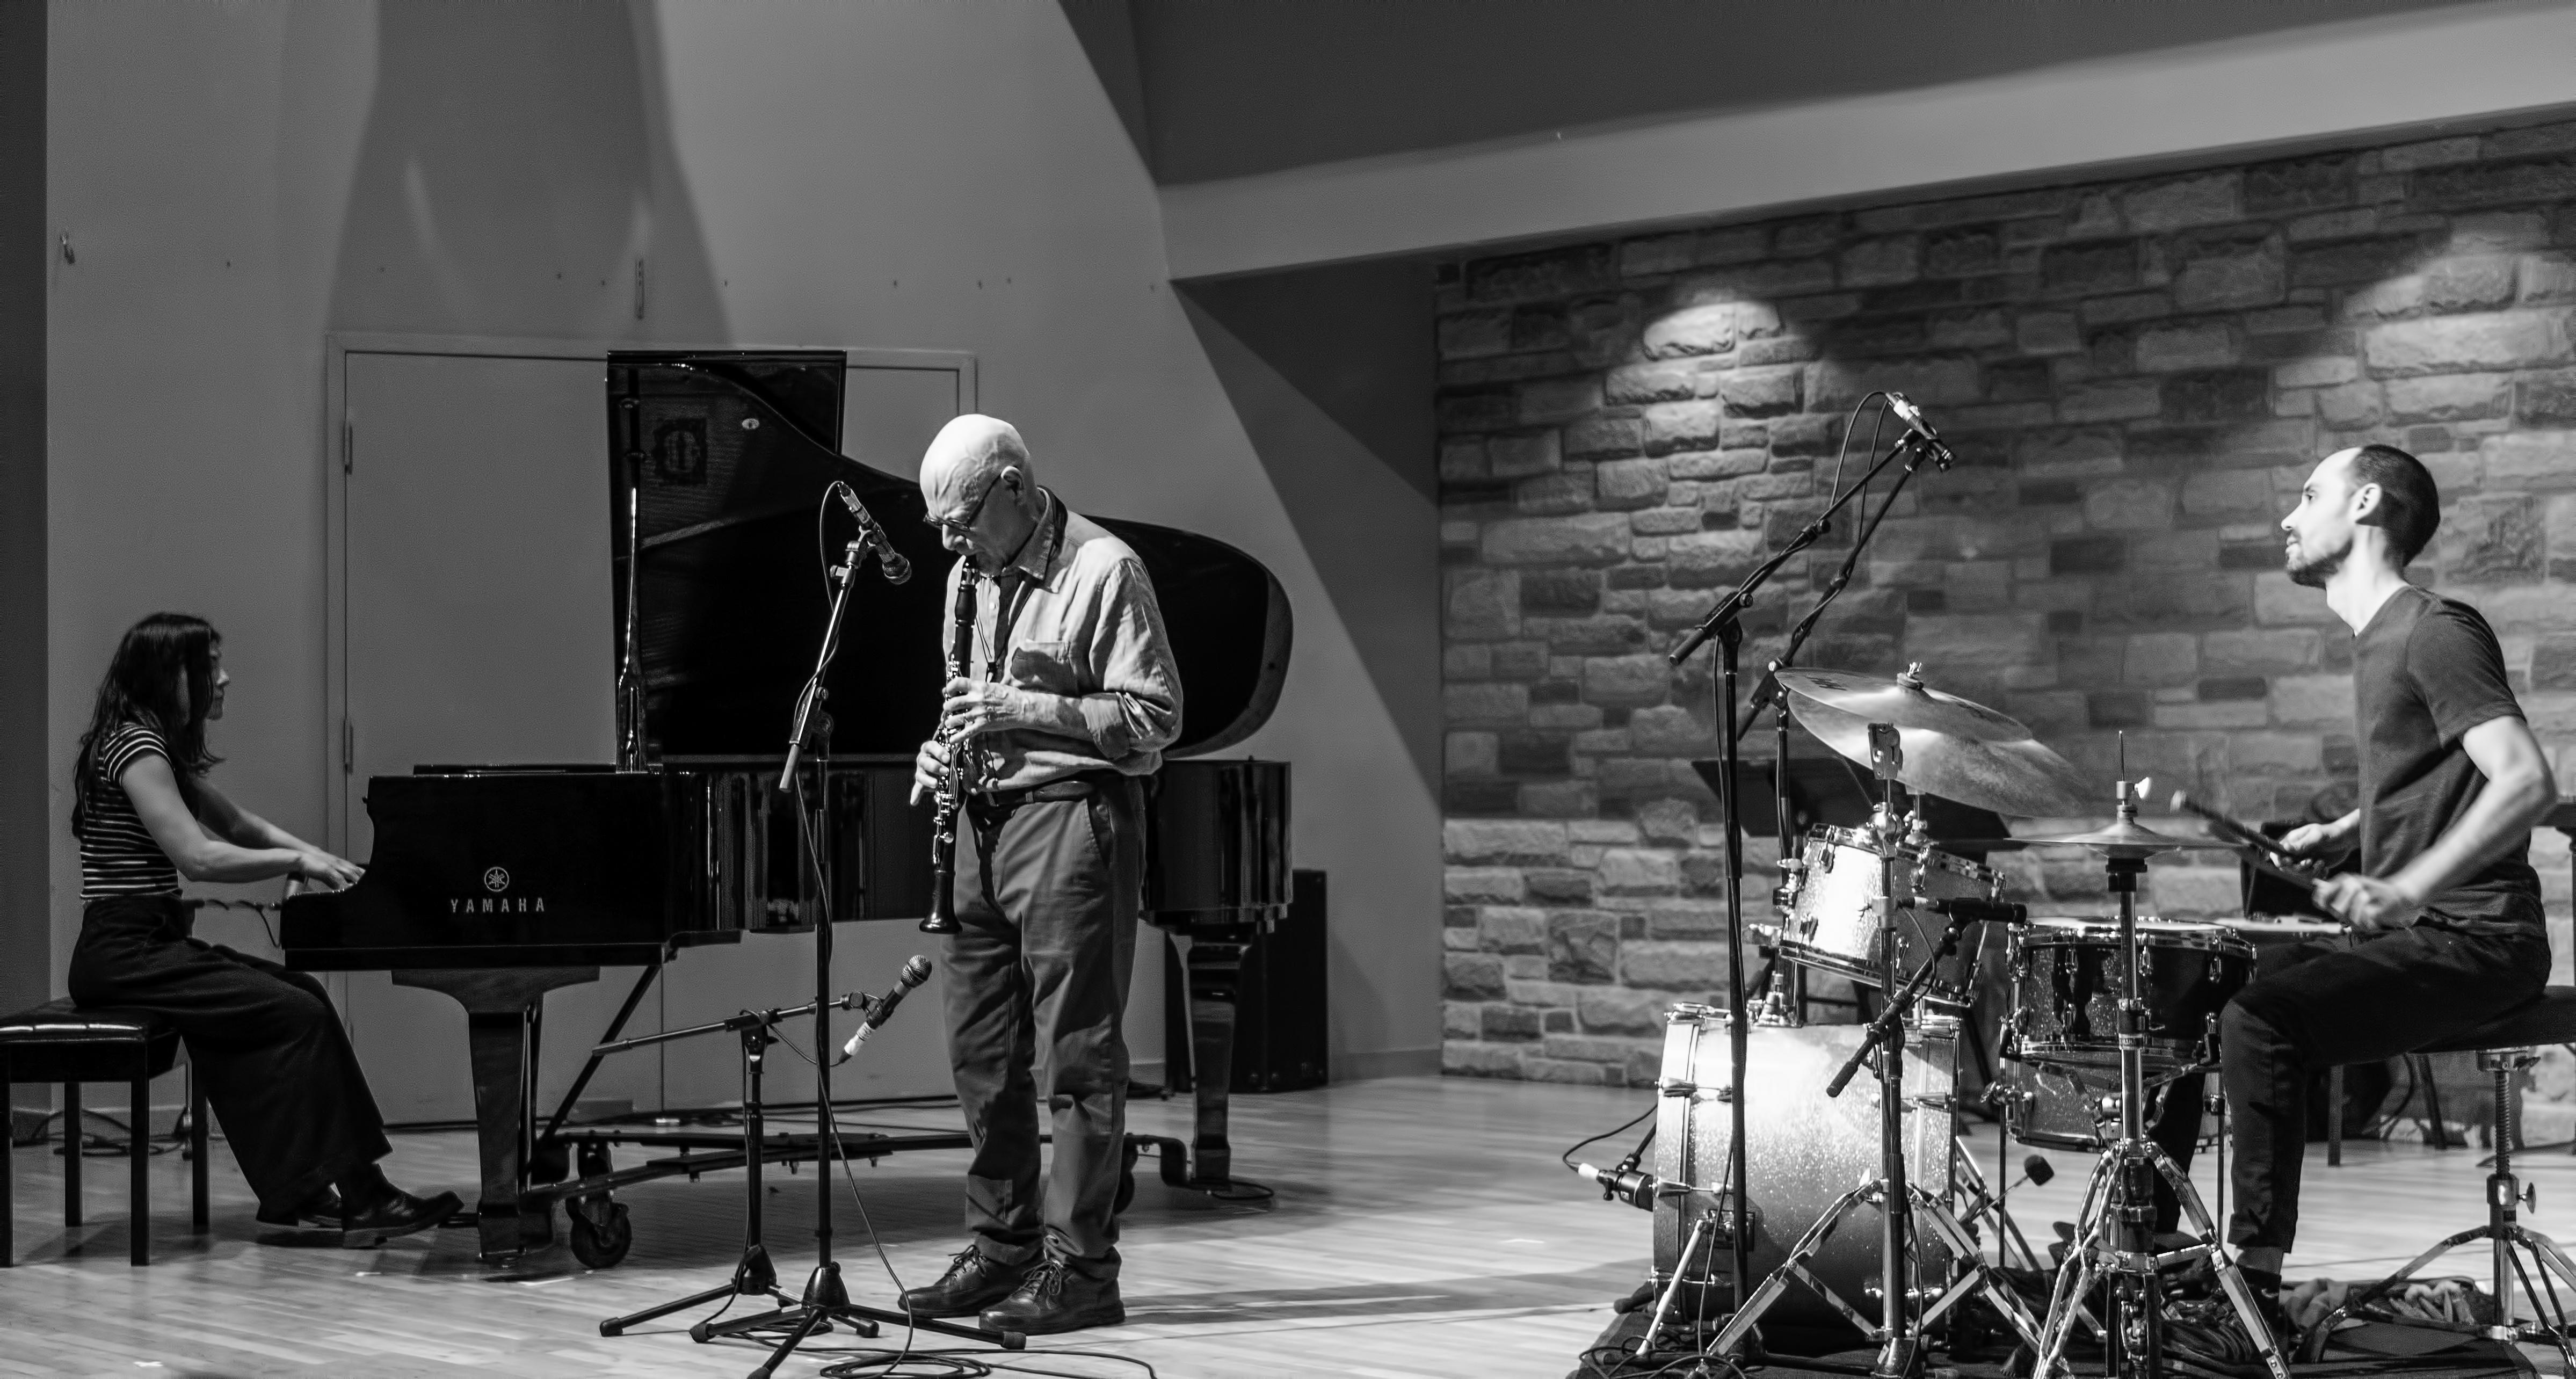 Paula Shocron, Guillermo Gregorio and Pablo Diaz with Dialogos at the Guelph Jazz Festival 2019